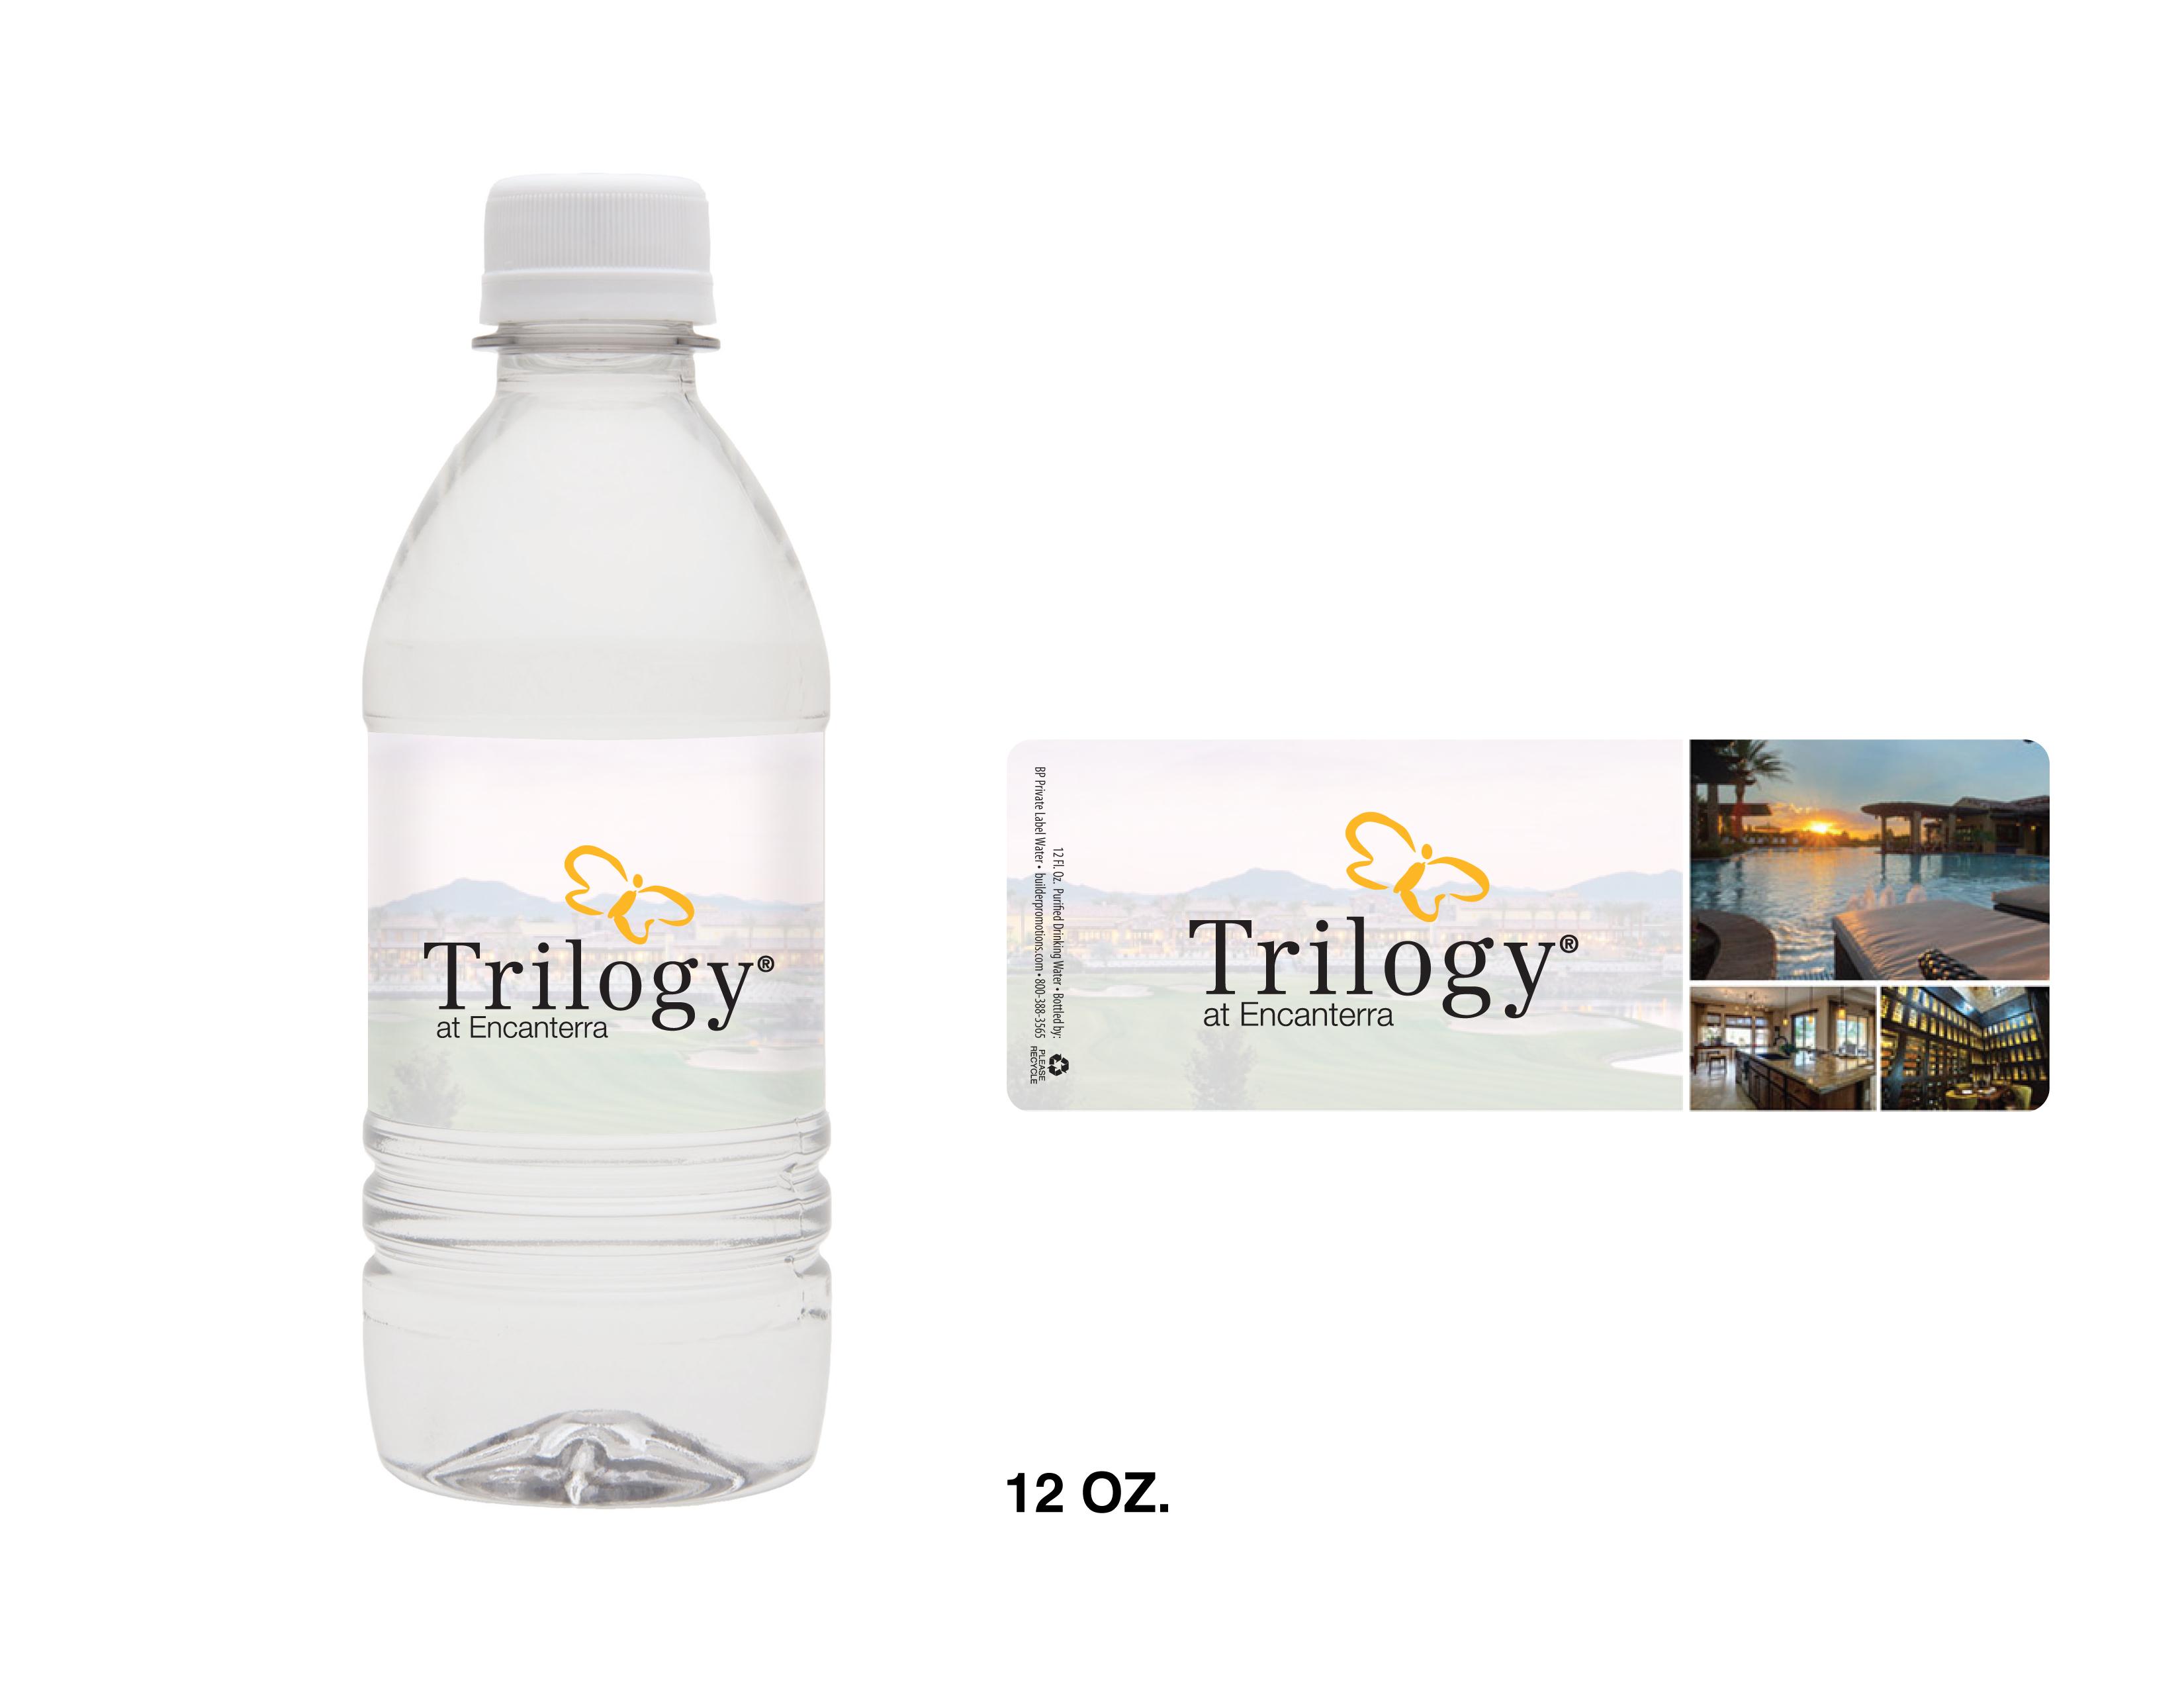 Trilogysample2